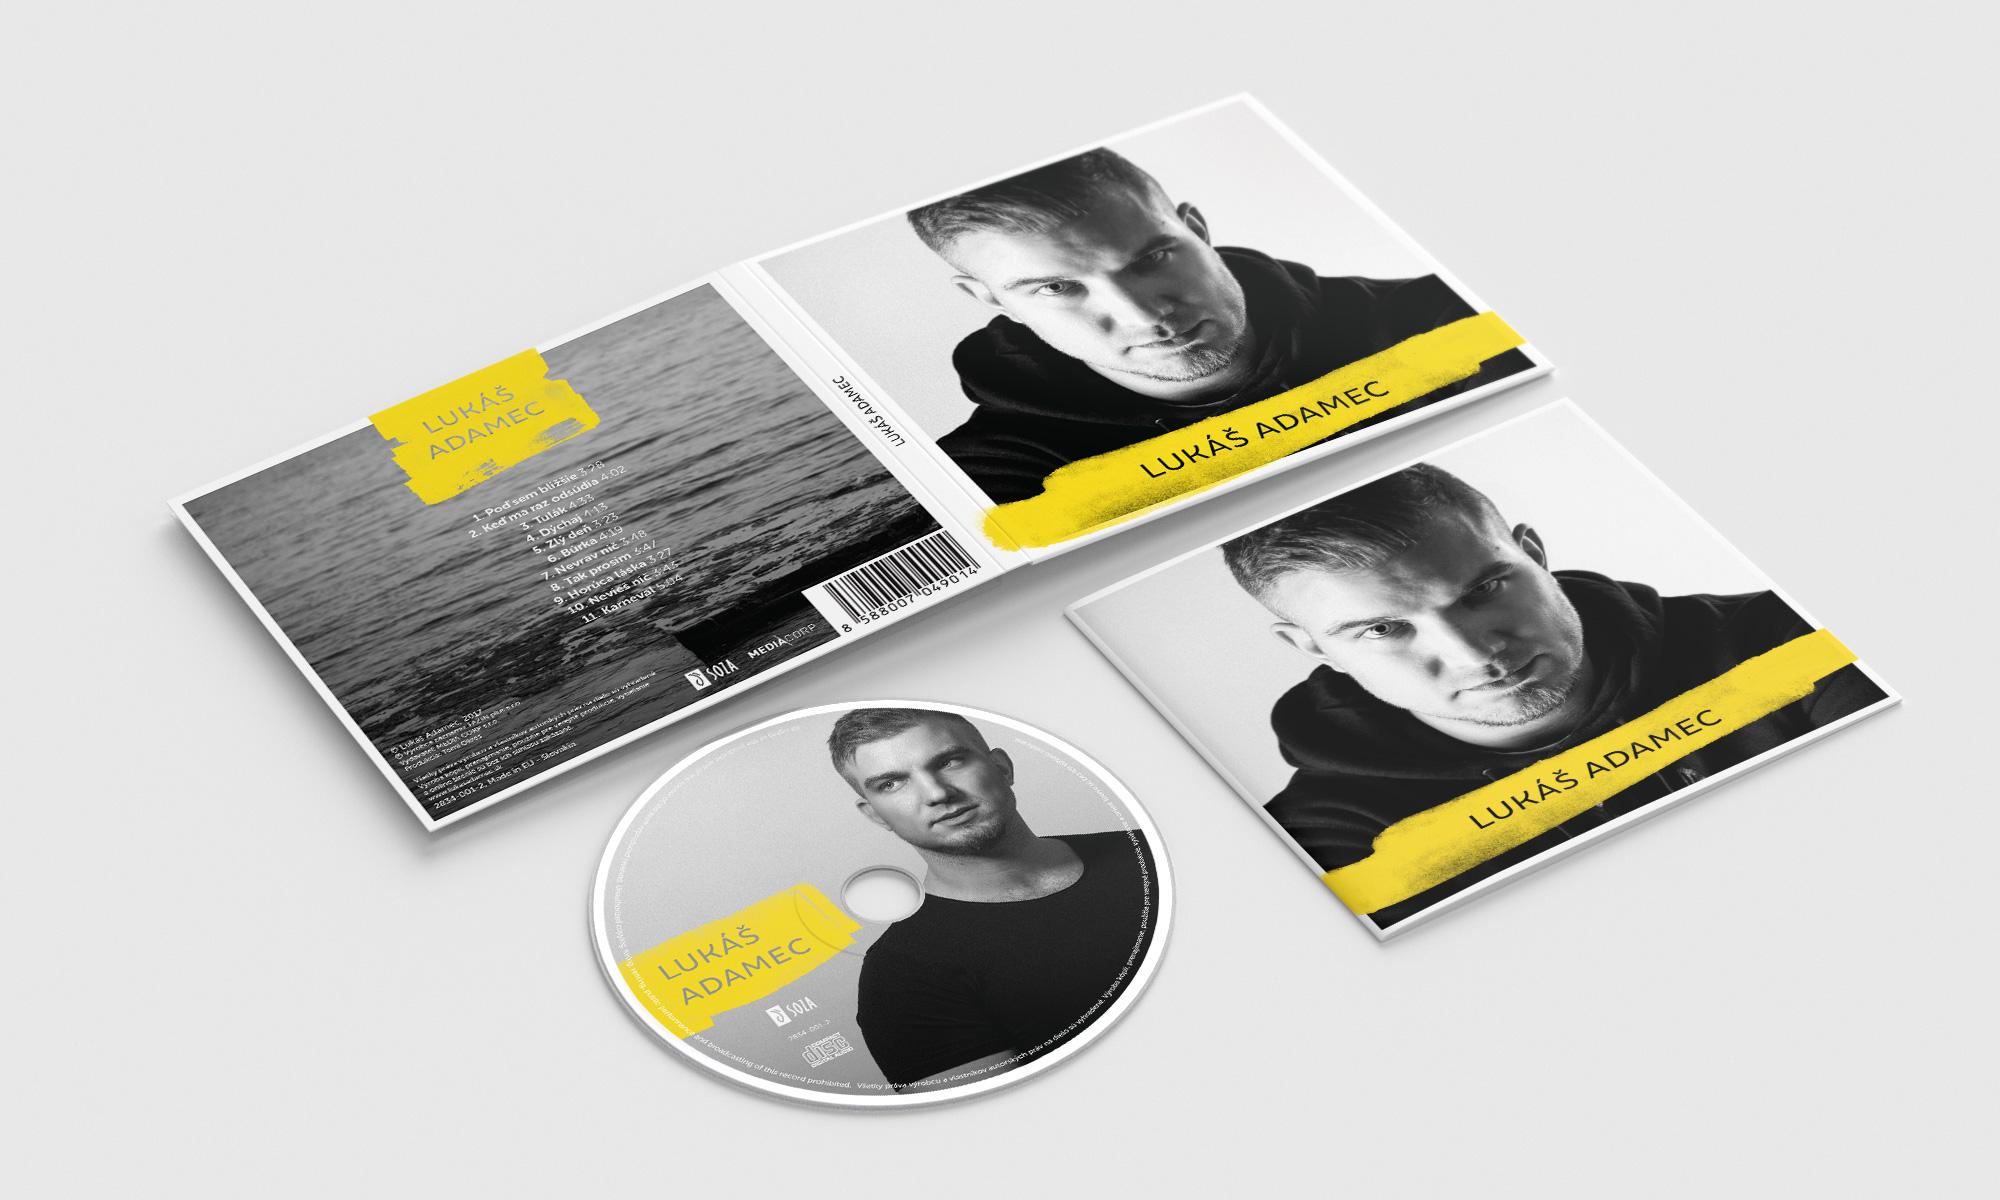 Lukáš Adamec - CD cover 2